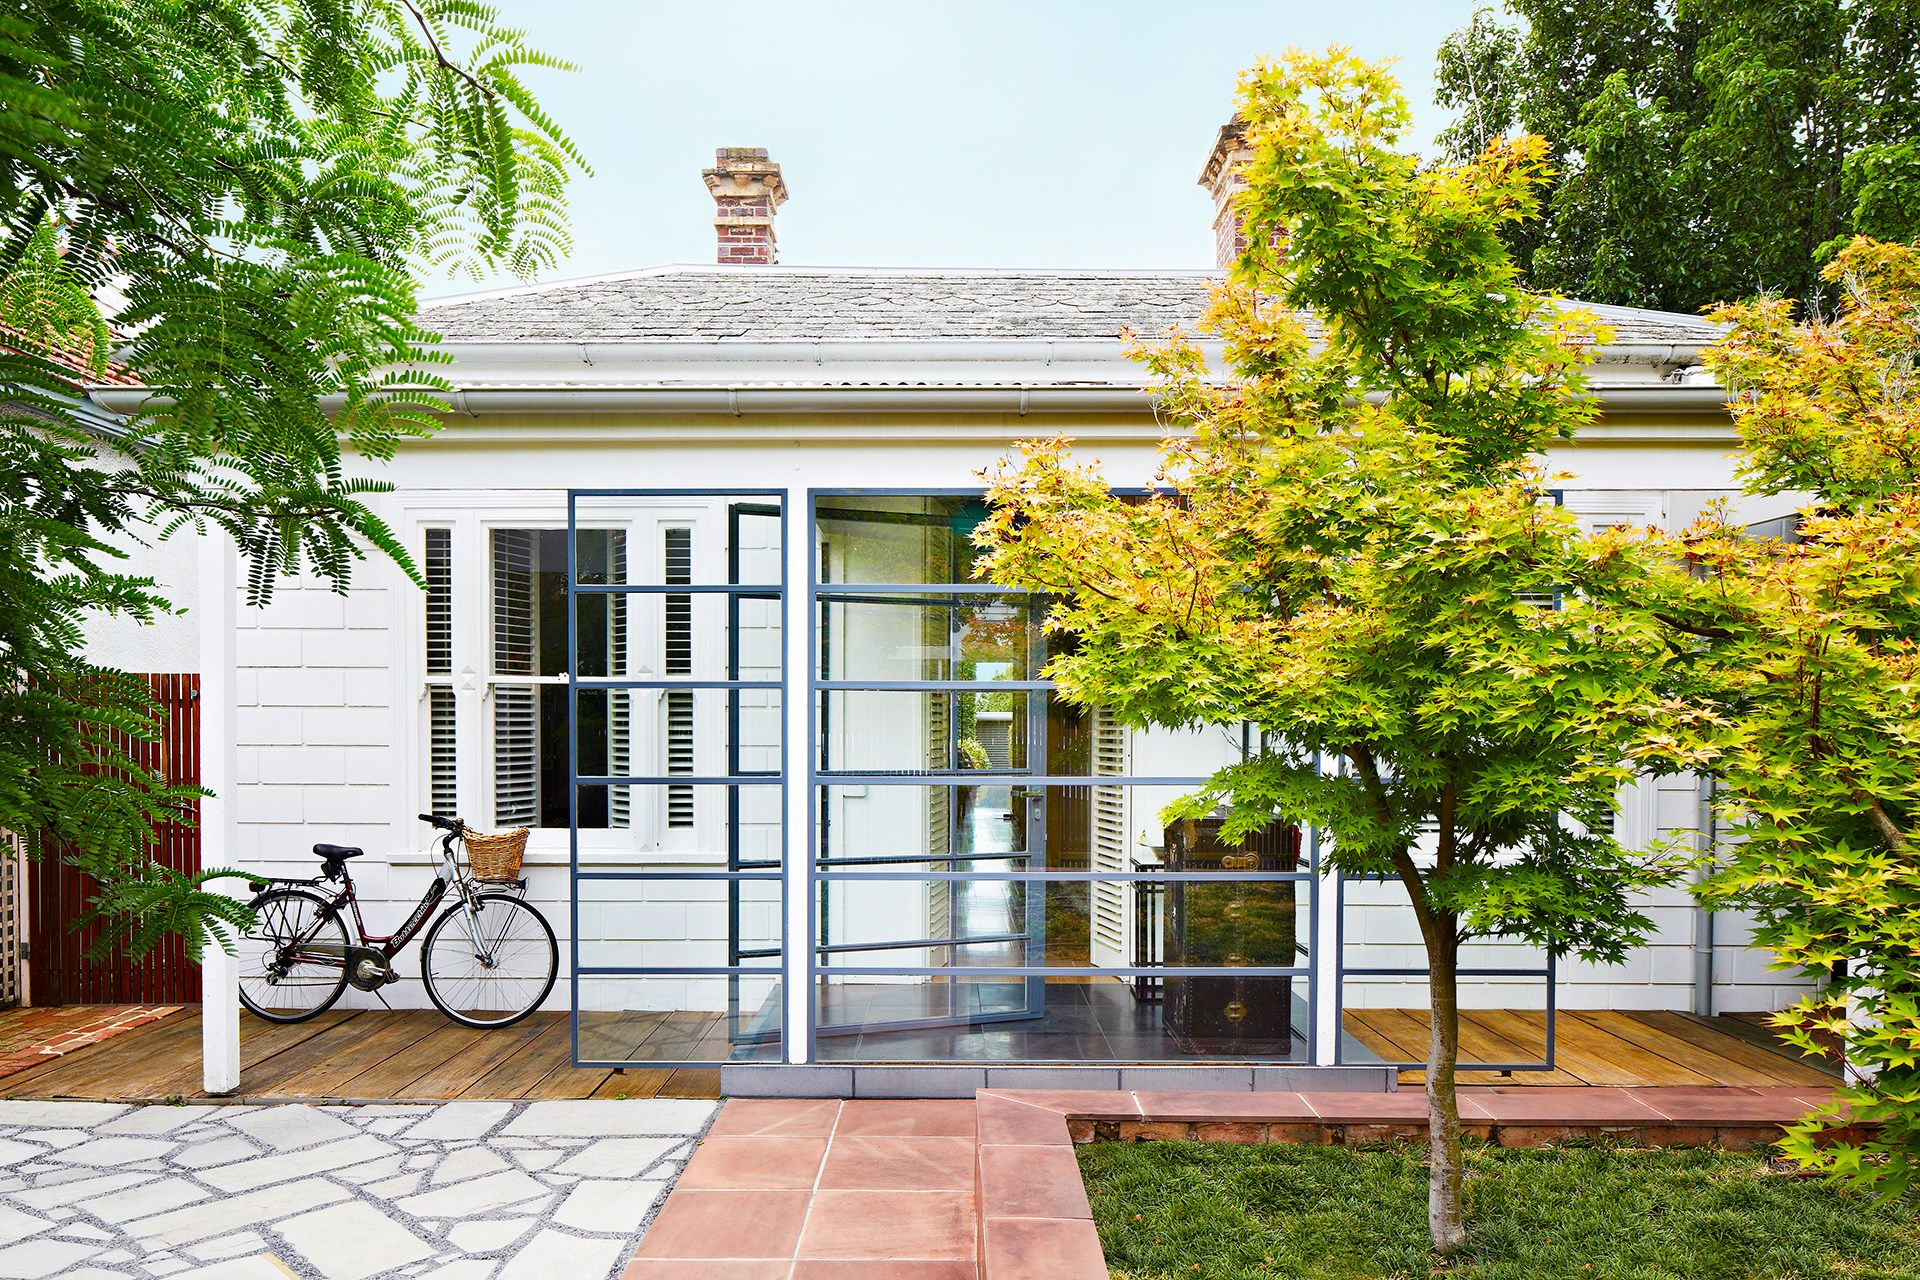 Take a tour of this [dynamic family home](http://www.homestolove.com.au/gallery-jon-and-vanessas-dynamic-family-home-plus-office-2275). Photo: Armelle Habib / *Australian House & Garden*